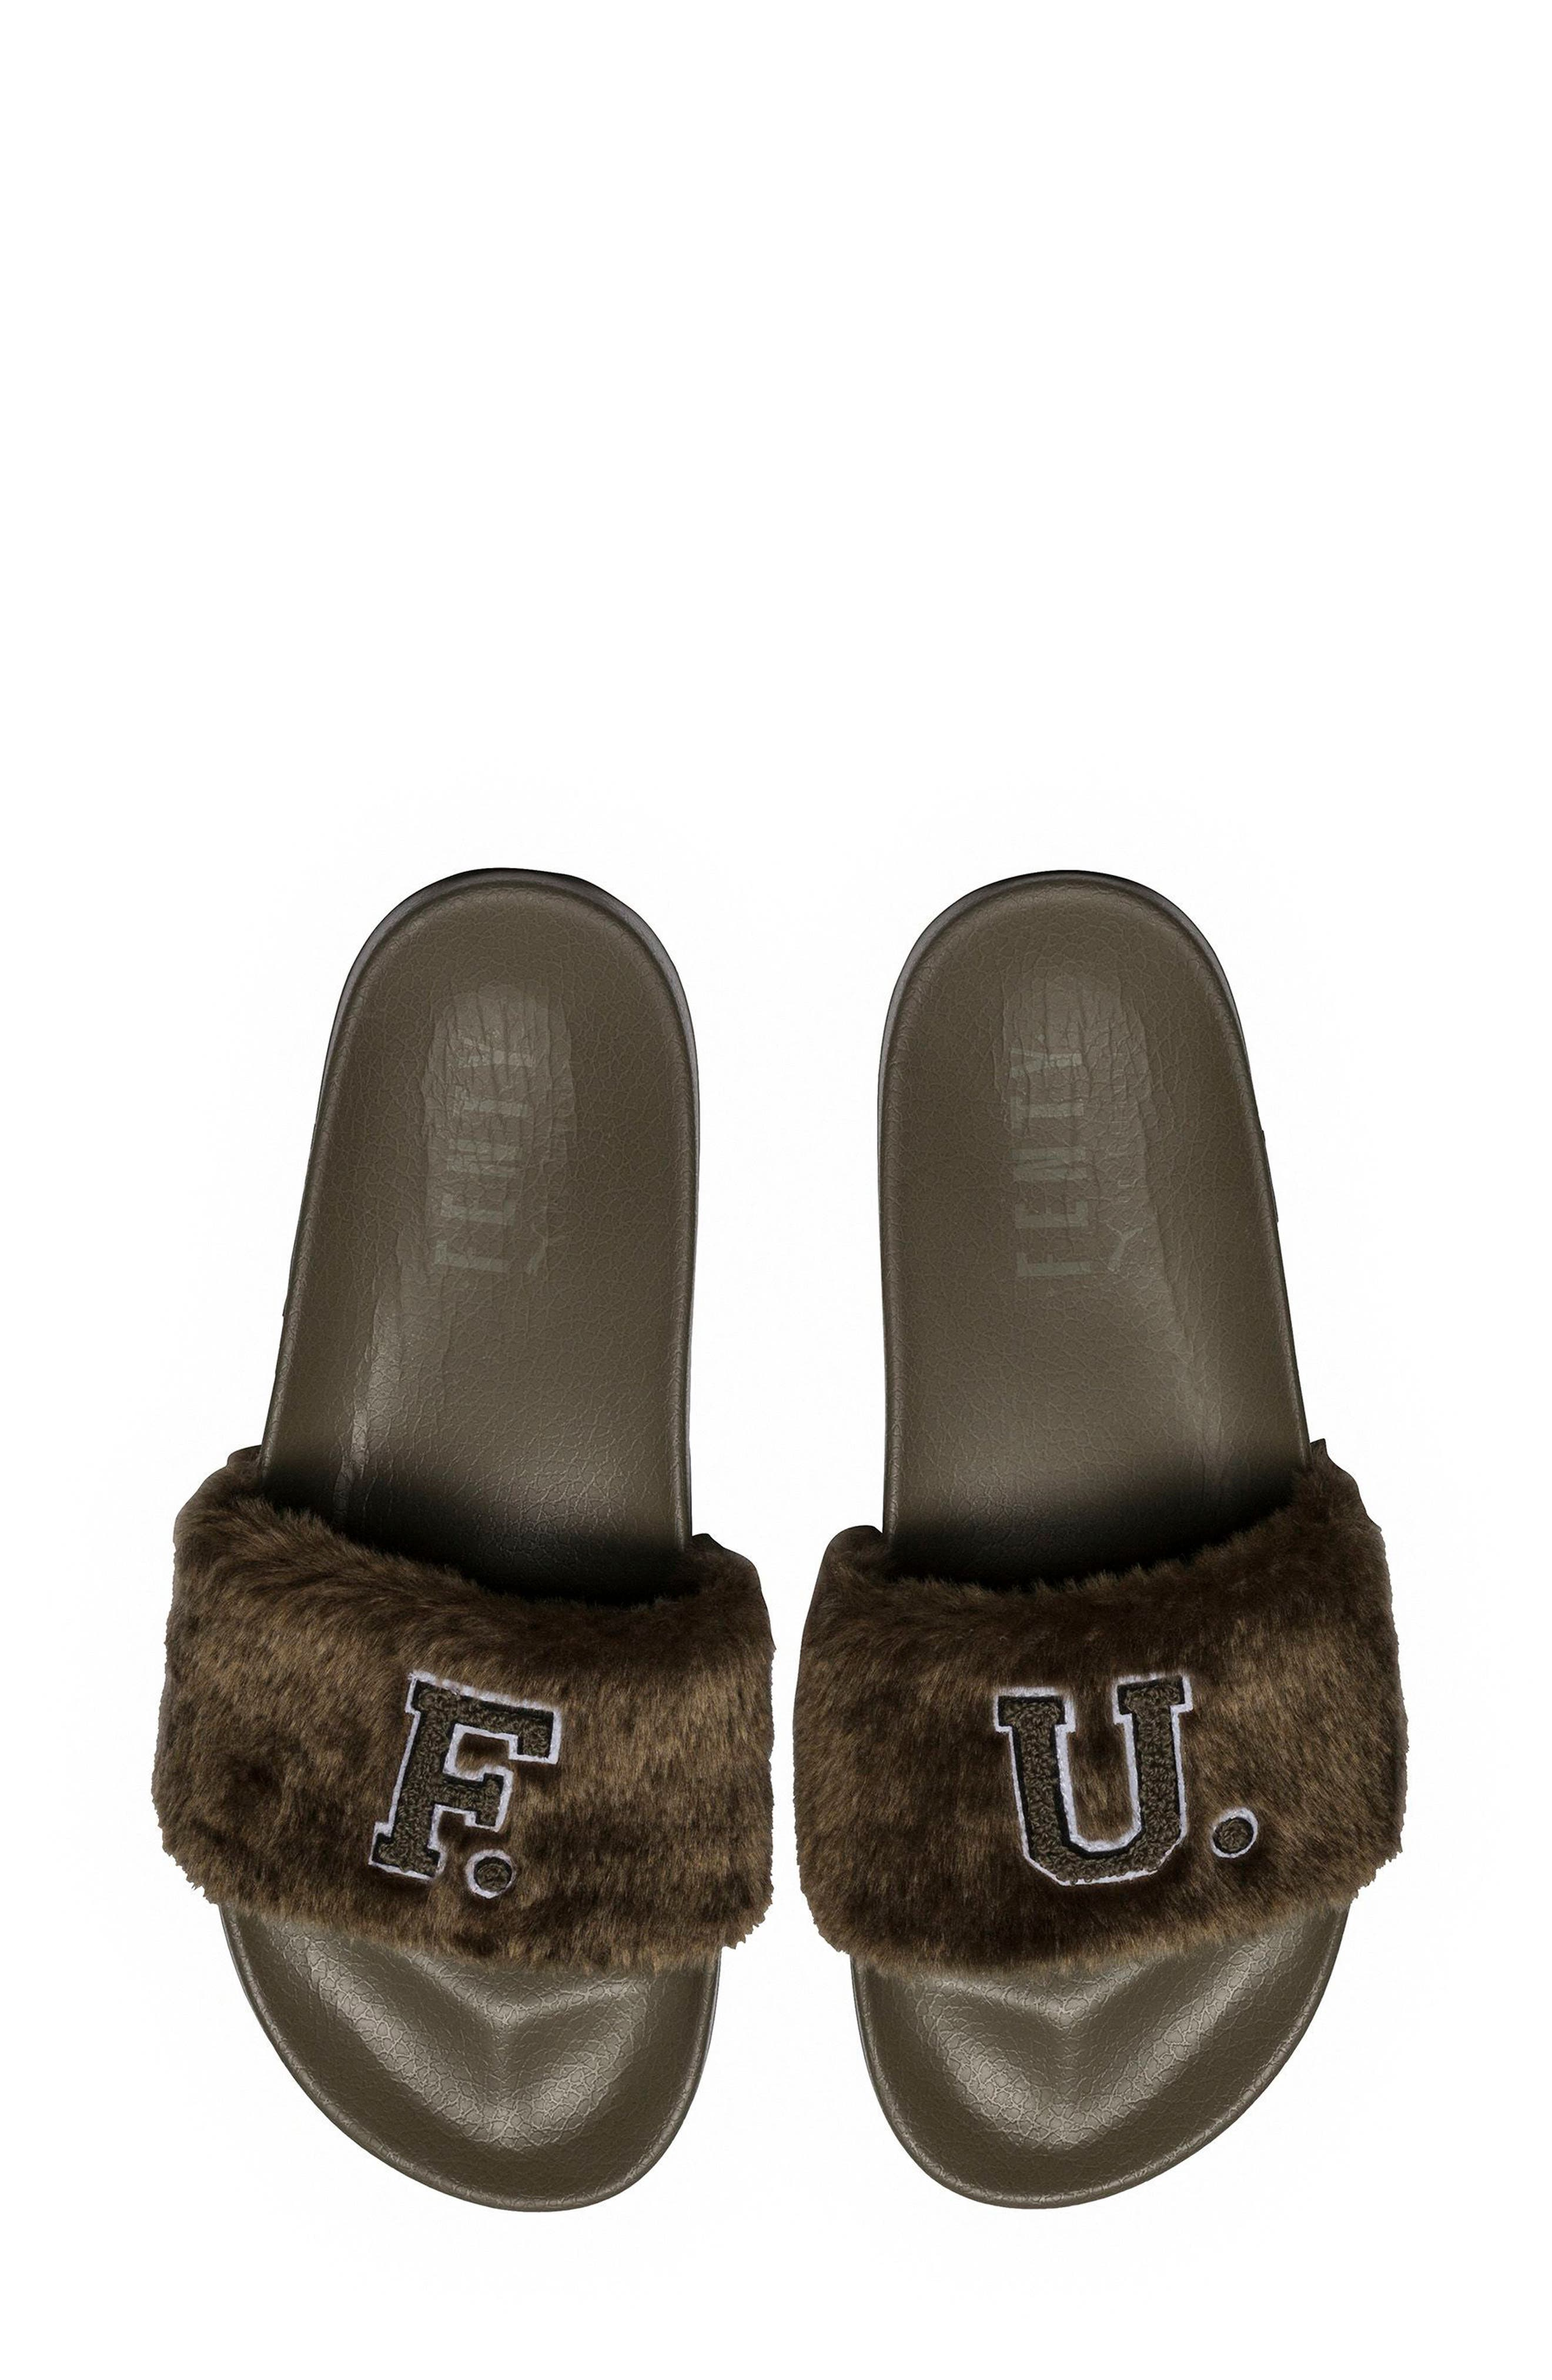 FENTY PUMA by Rihanna Lead Cat Slide Sandals,                             Main thumbnail 1, color,                             Burnt Olive - Puma Black